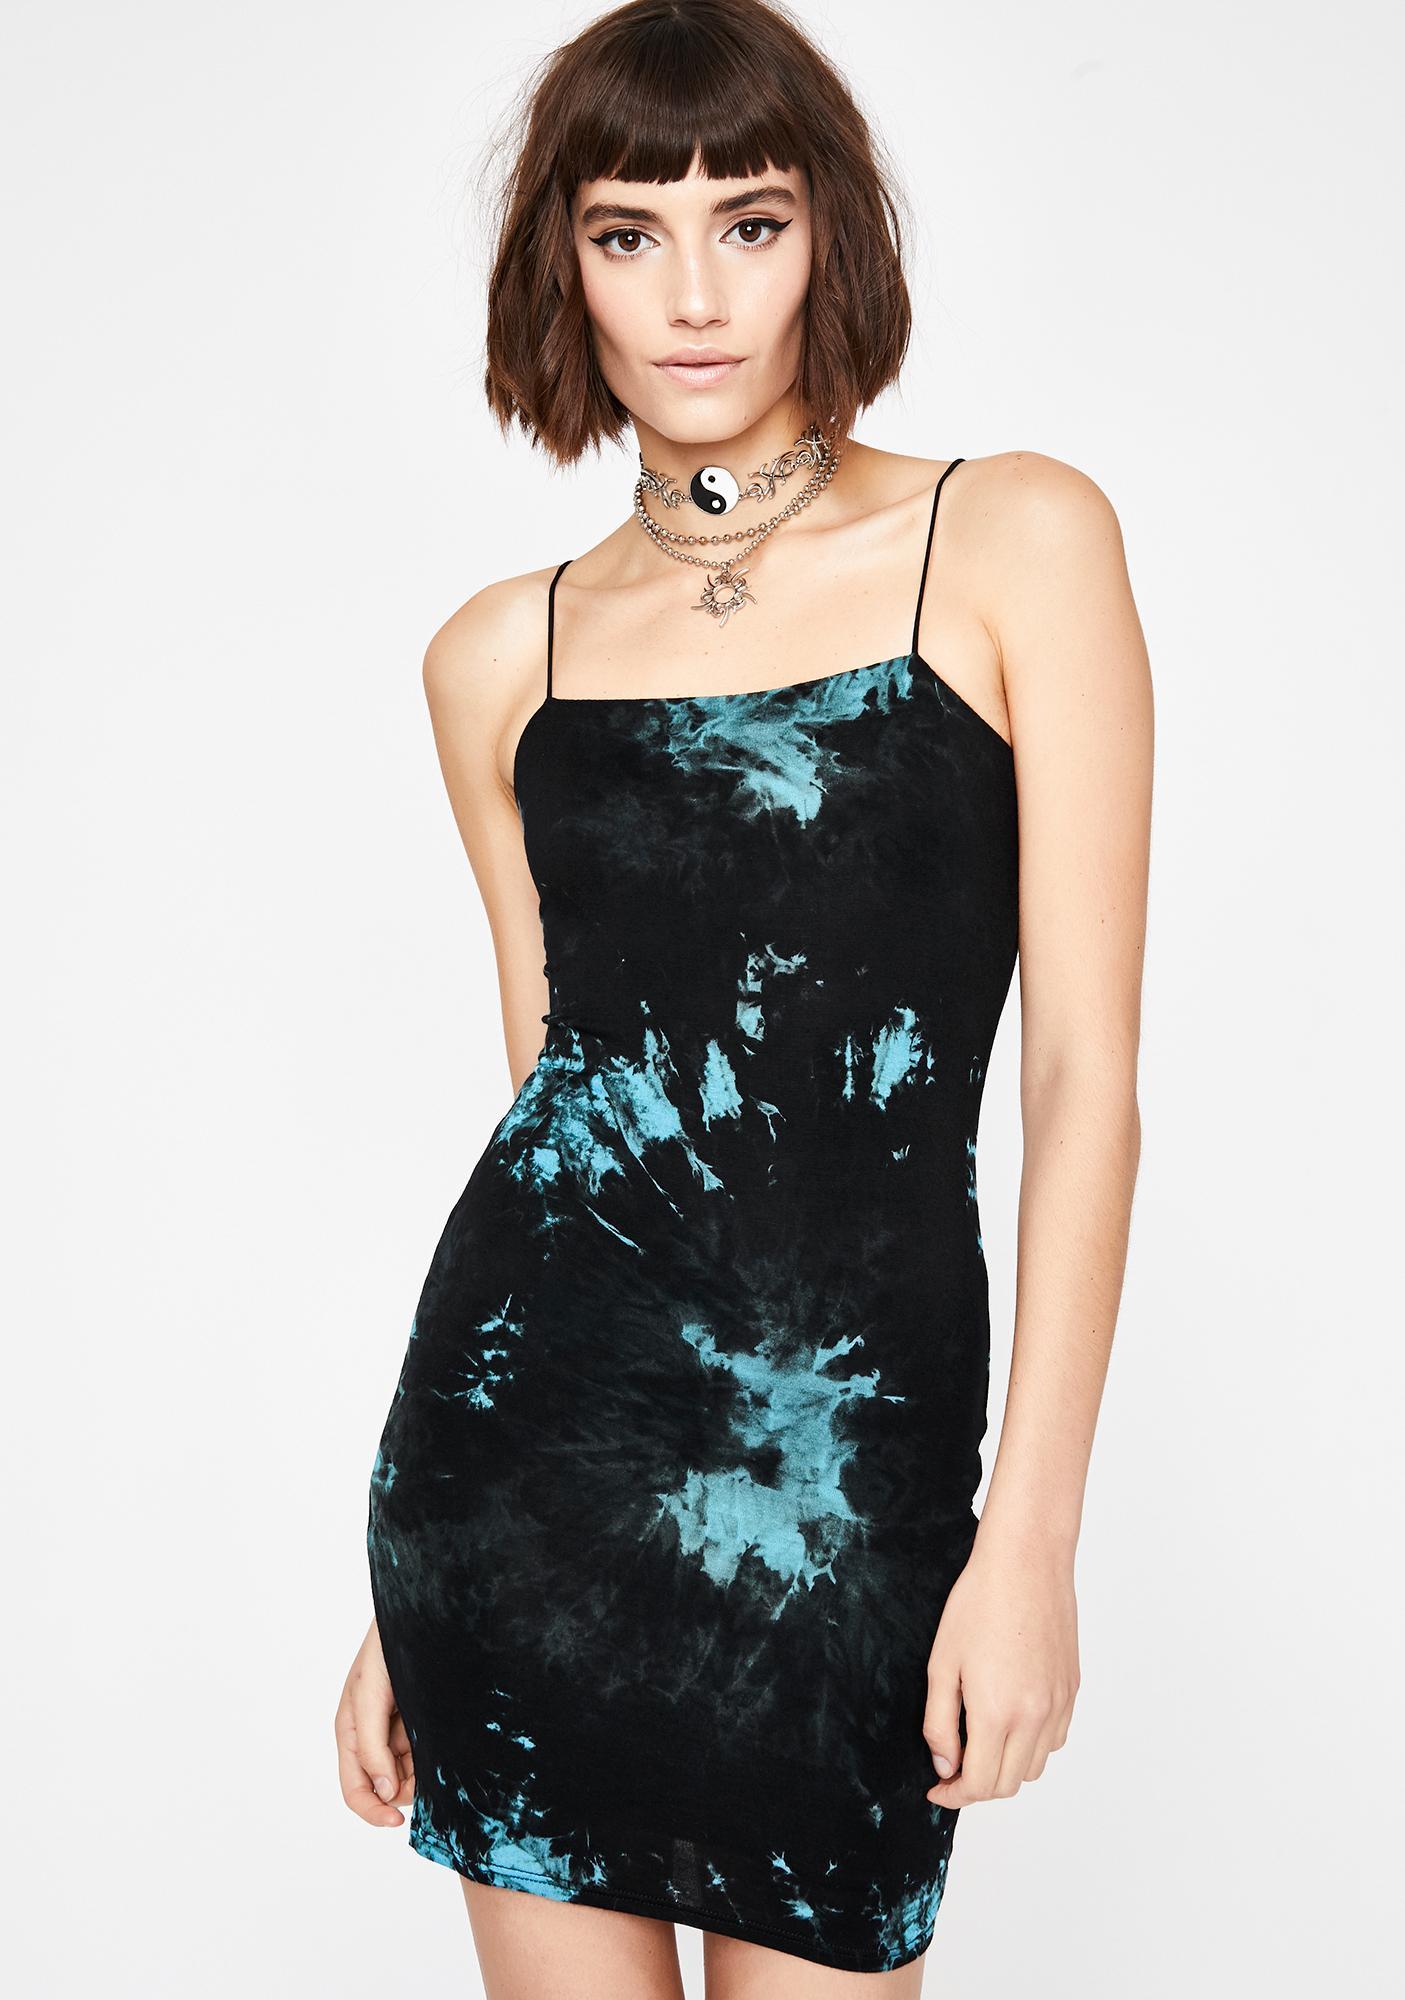 Aqua Curfew Crusader Tie Dye Dress